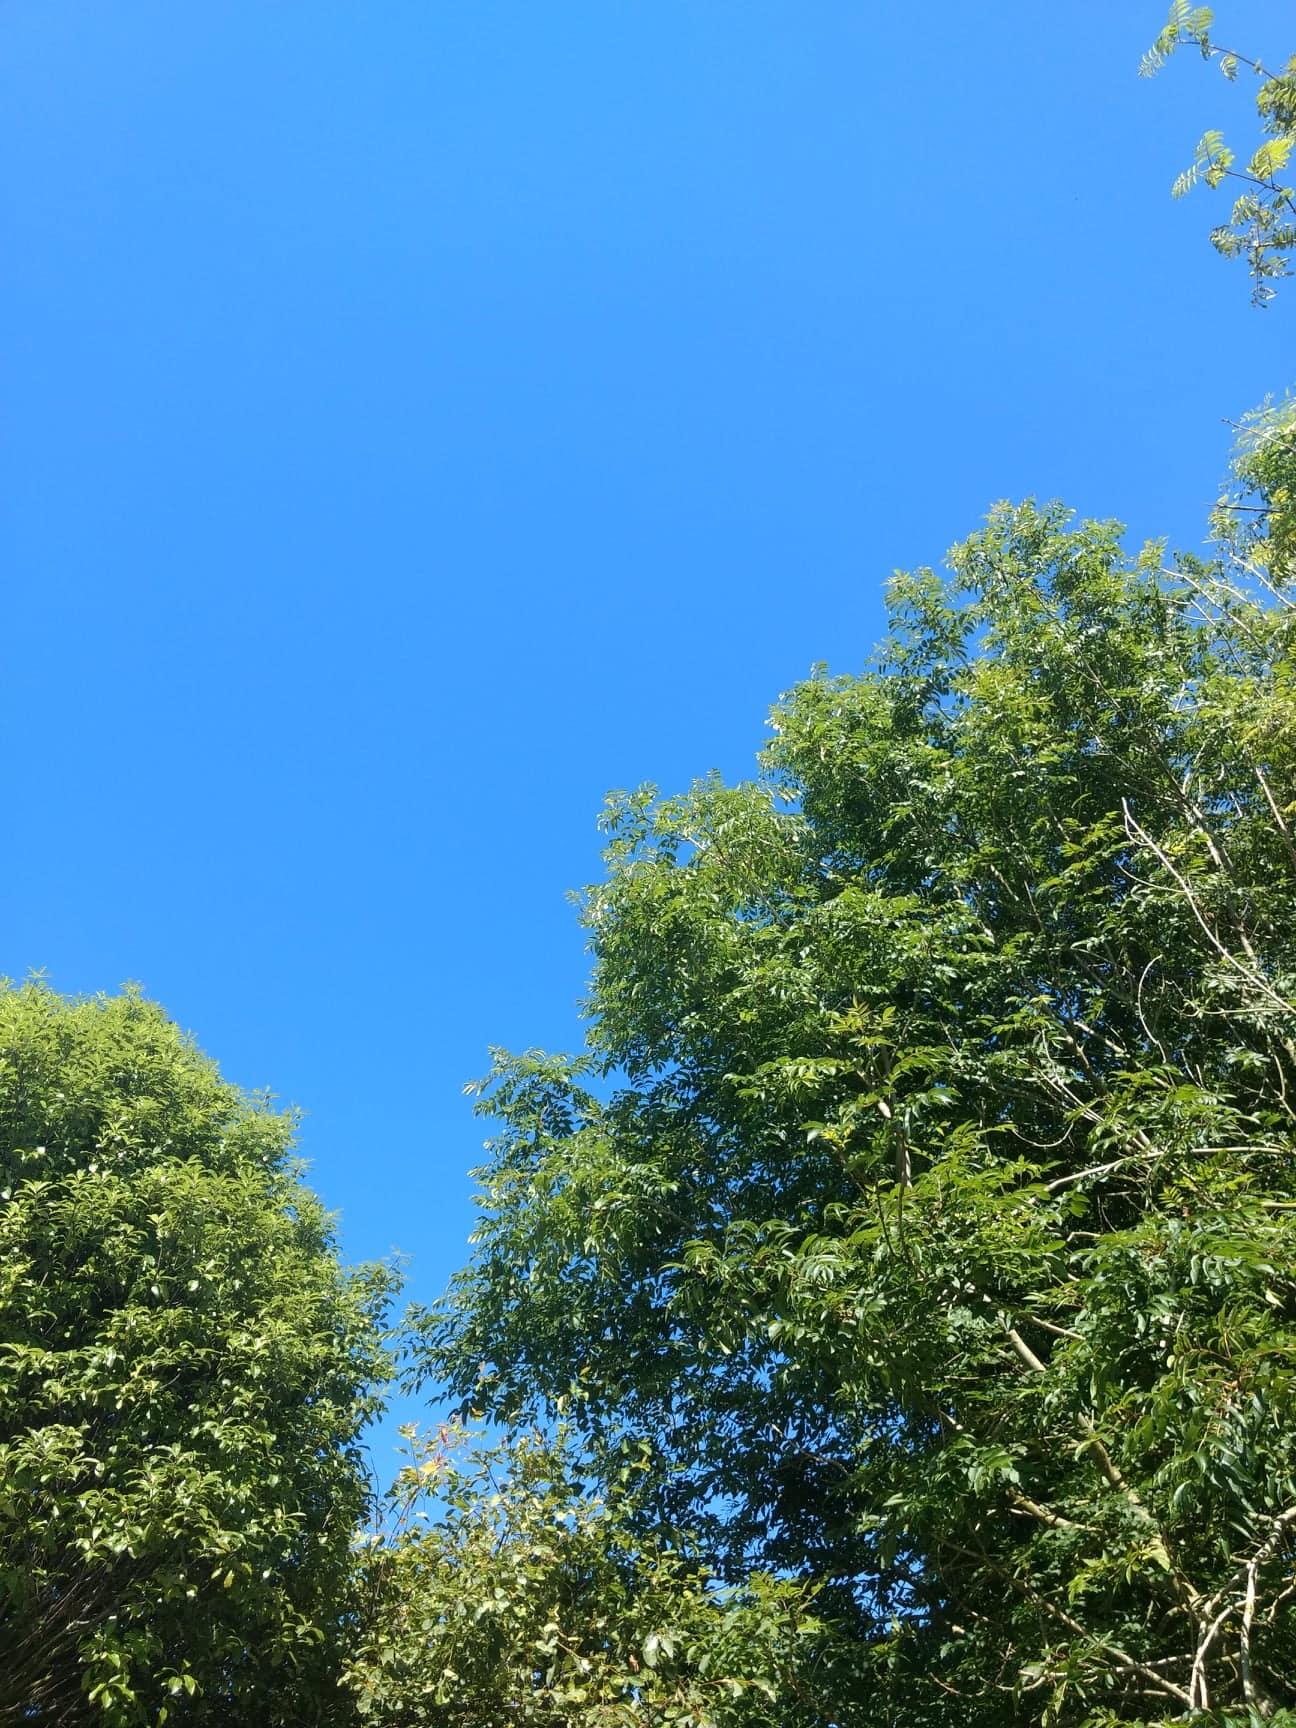 Trees in summer.jpg